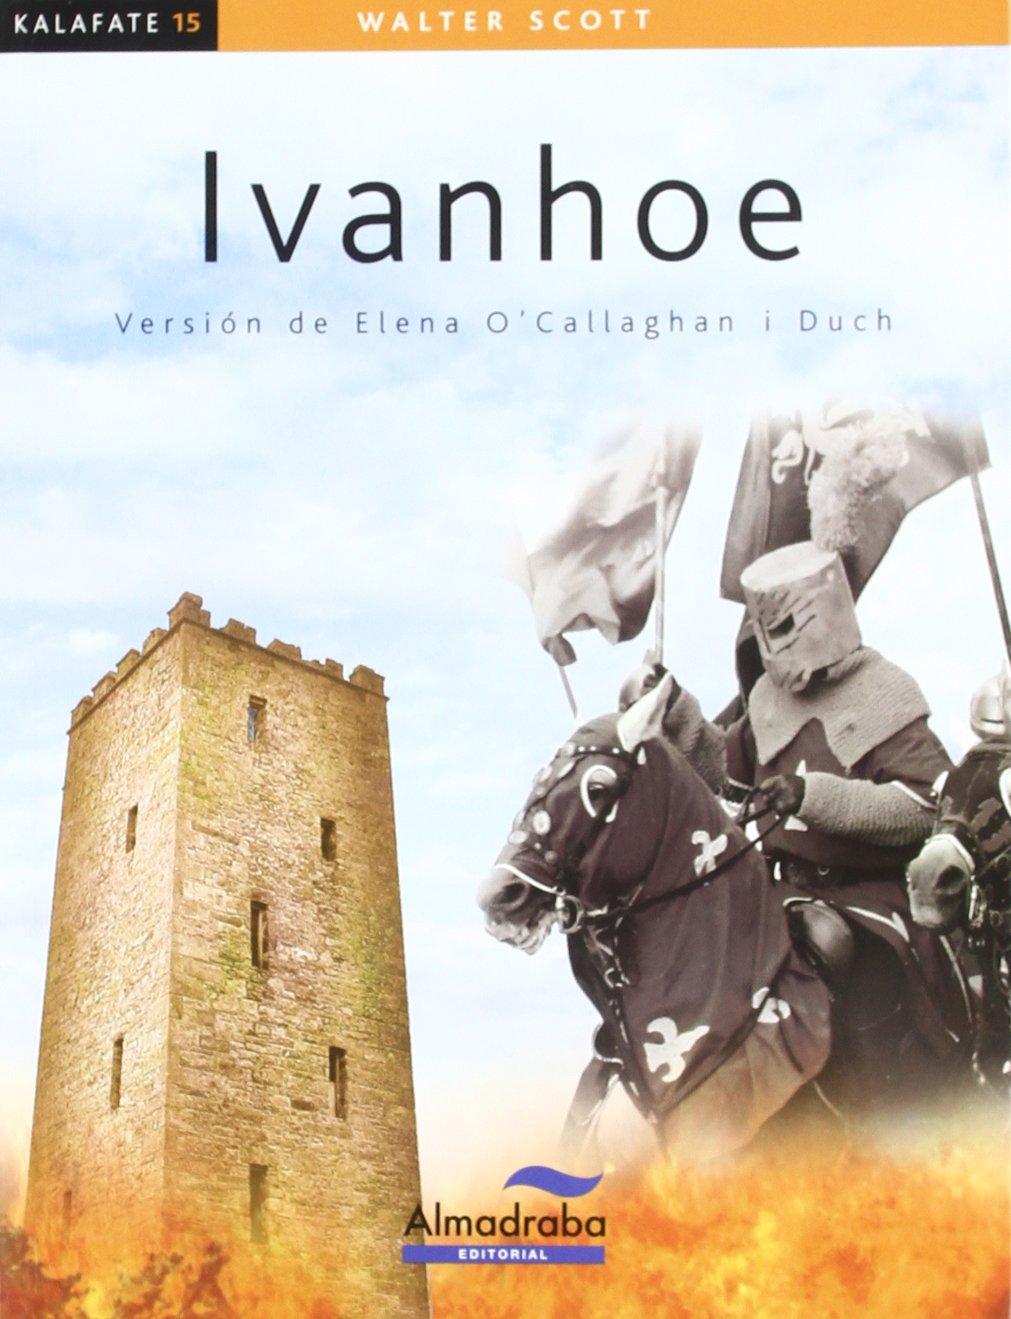 Ivanhoe (kalafate) (Colección Kalafate): Amazon.es: Scott, Walter, Bosch, J., Elena OCallaghan Duch, OCallaghan i Duch, Elena: Libros